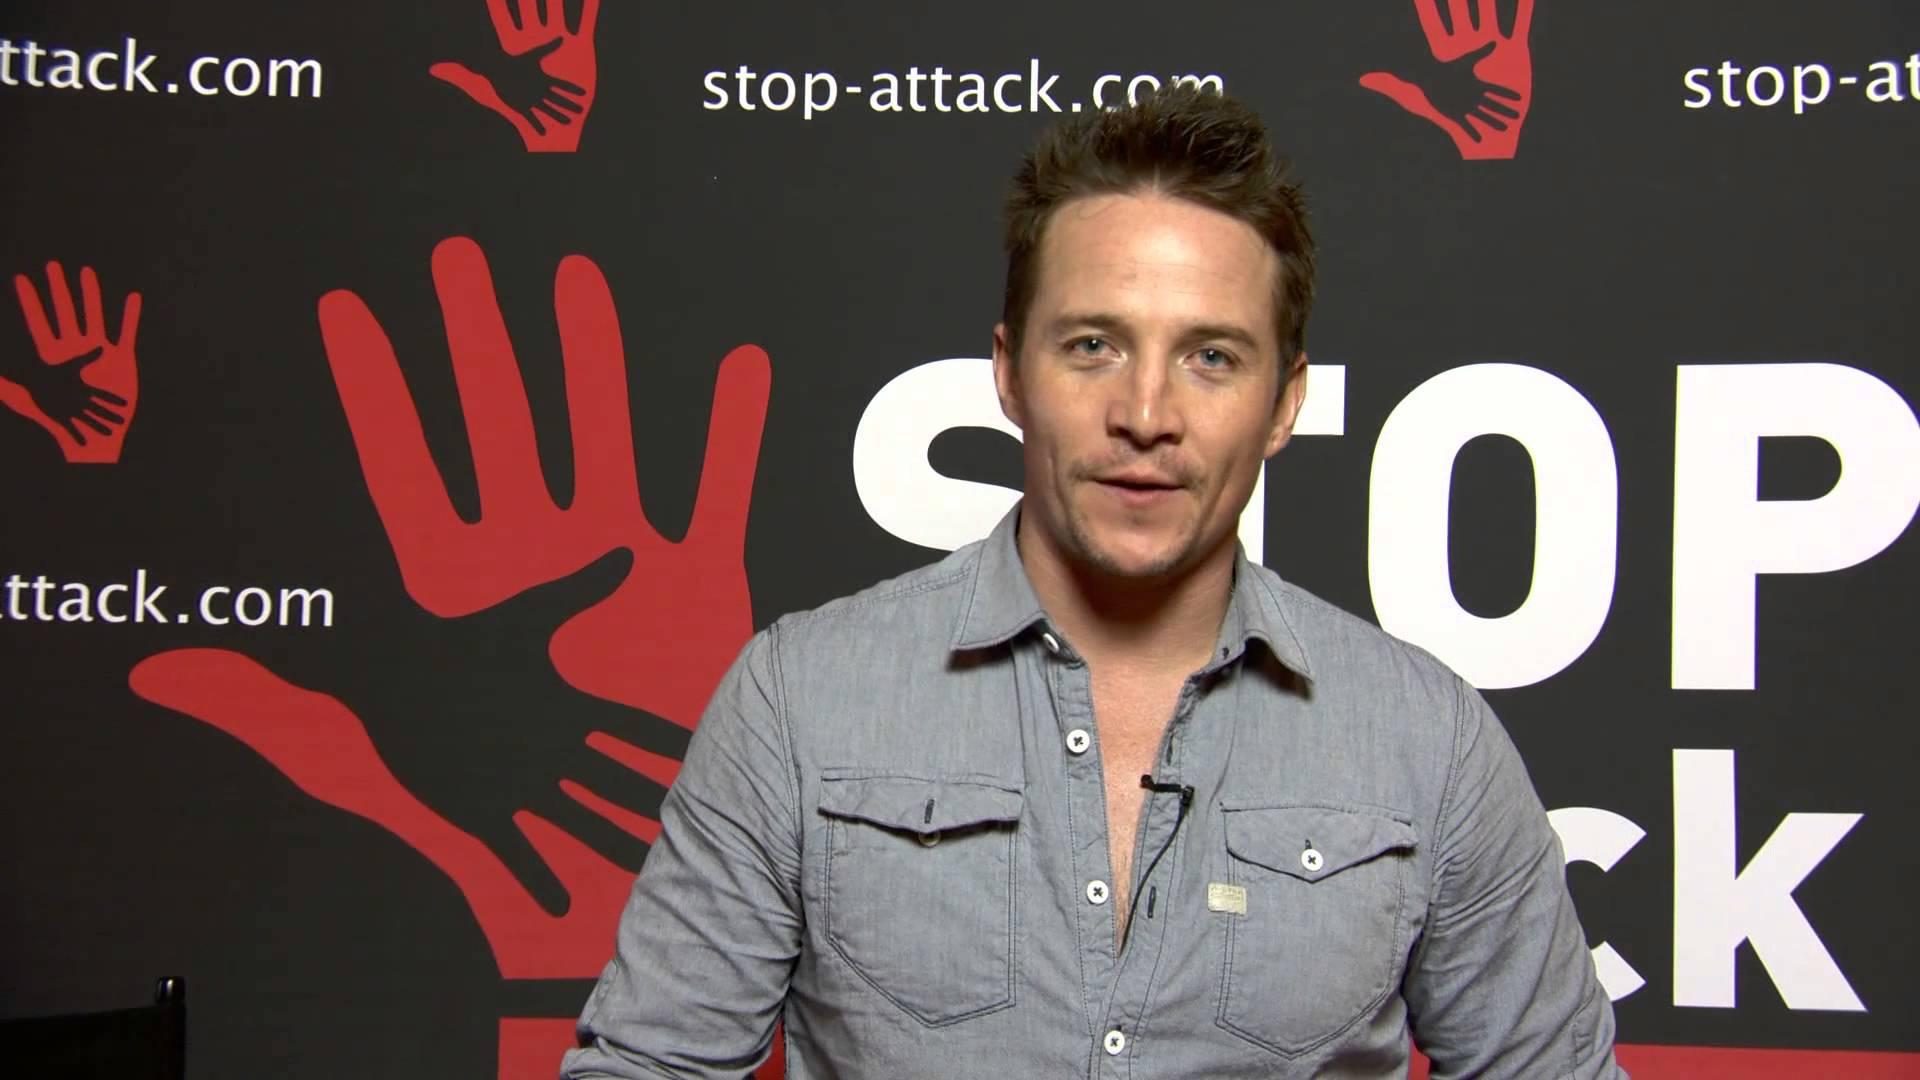 Mark pellegrino cyberbullying movie tv tech geeks interview